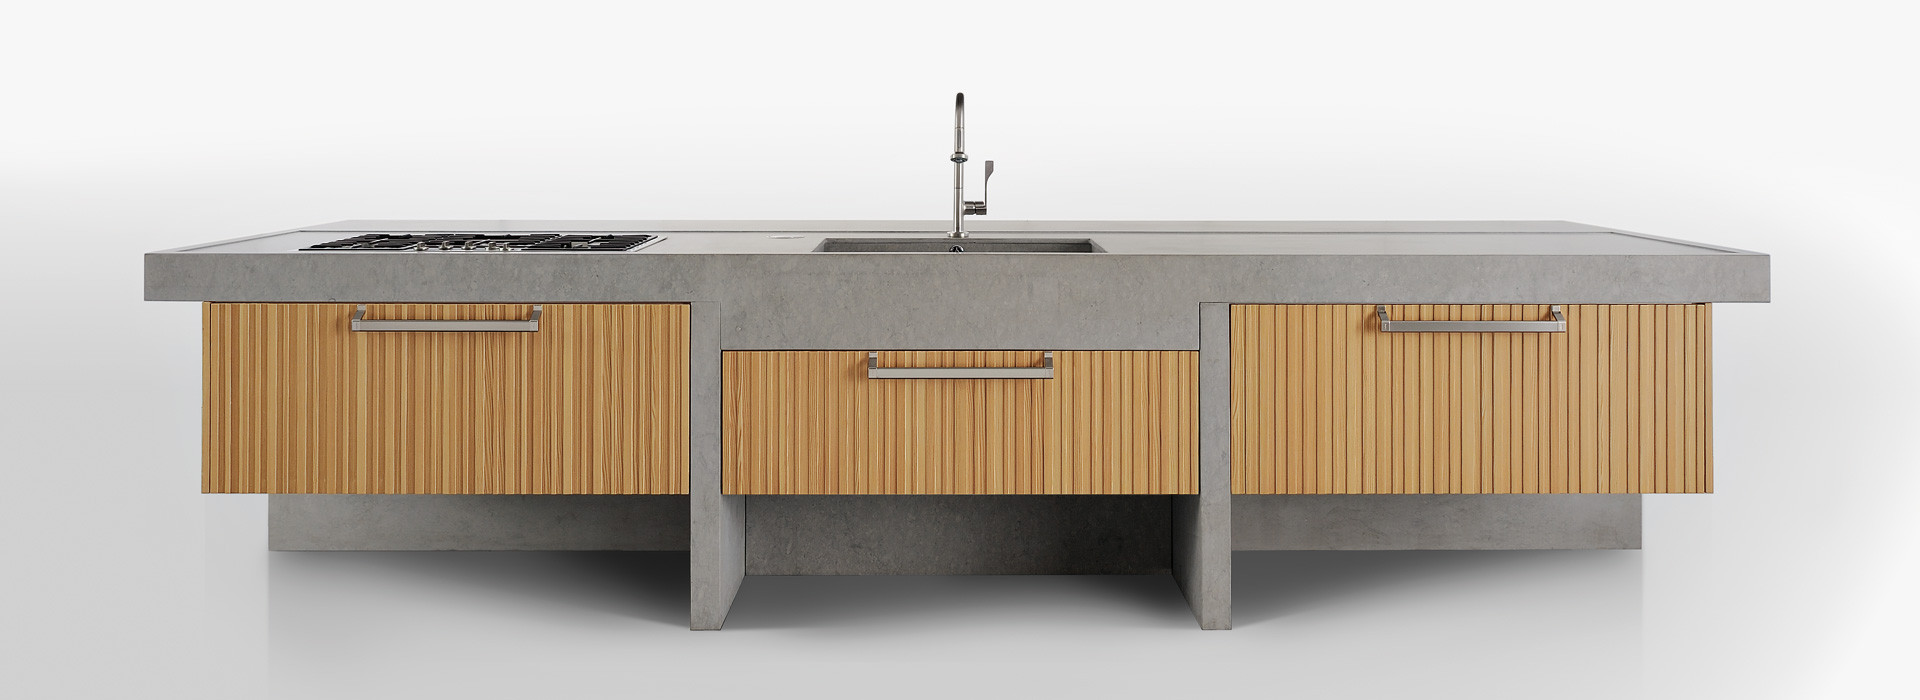 lignum et lapis produkte arclinea. Black Bedroom Furniture Sets. Home Design Ideas